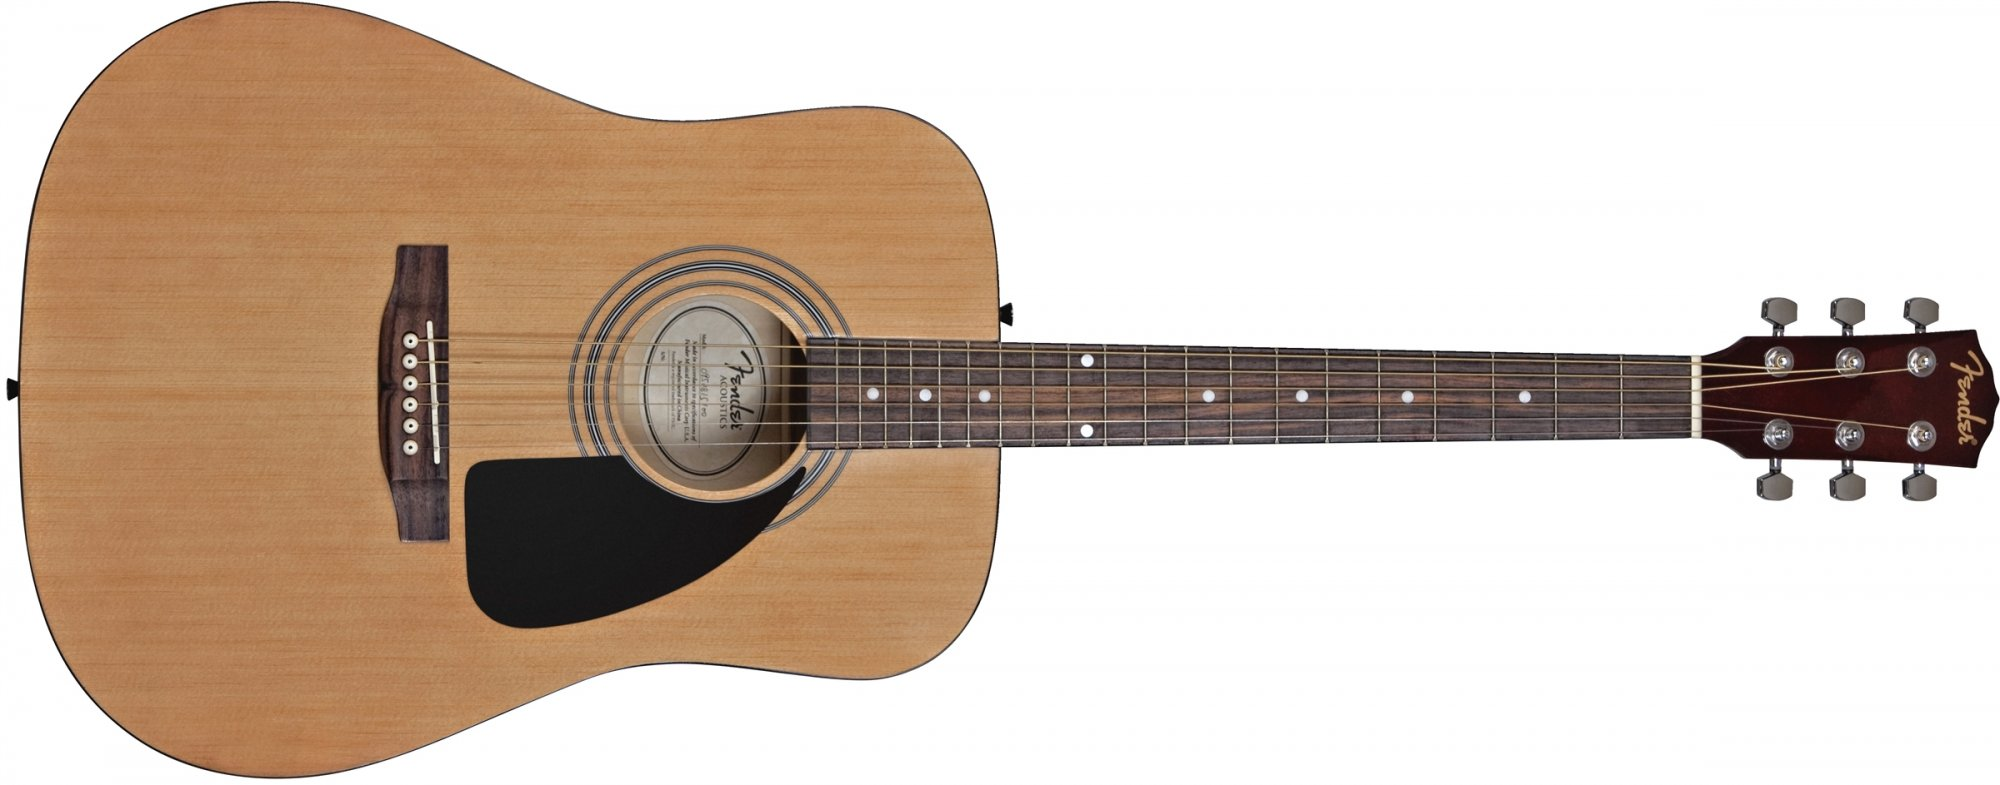 Fender FA-100 Natural Acoustic Guitar Pack